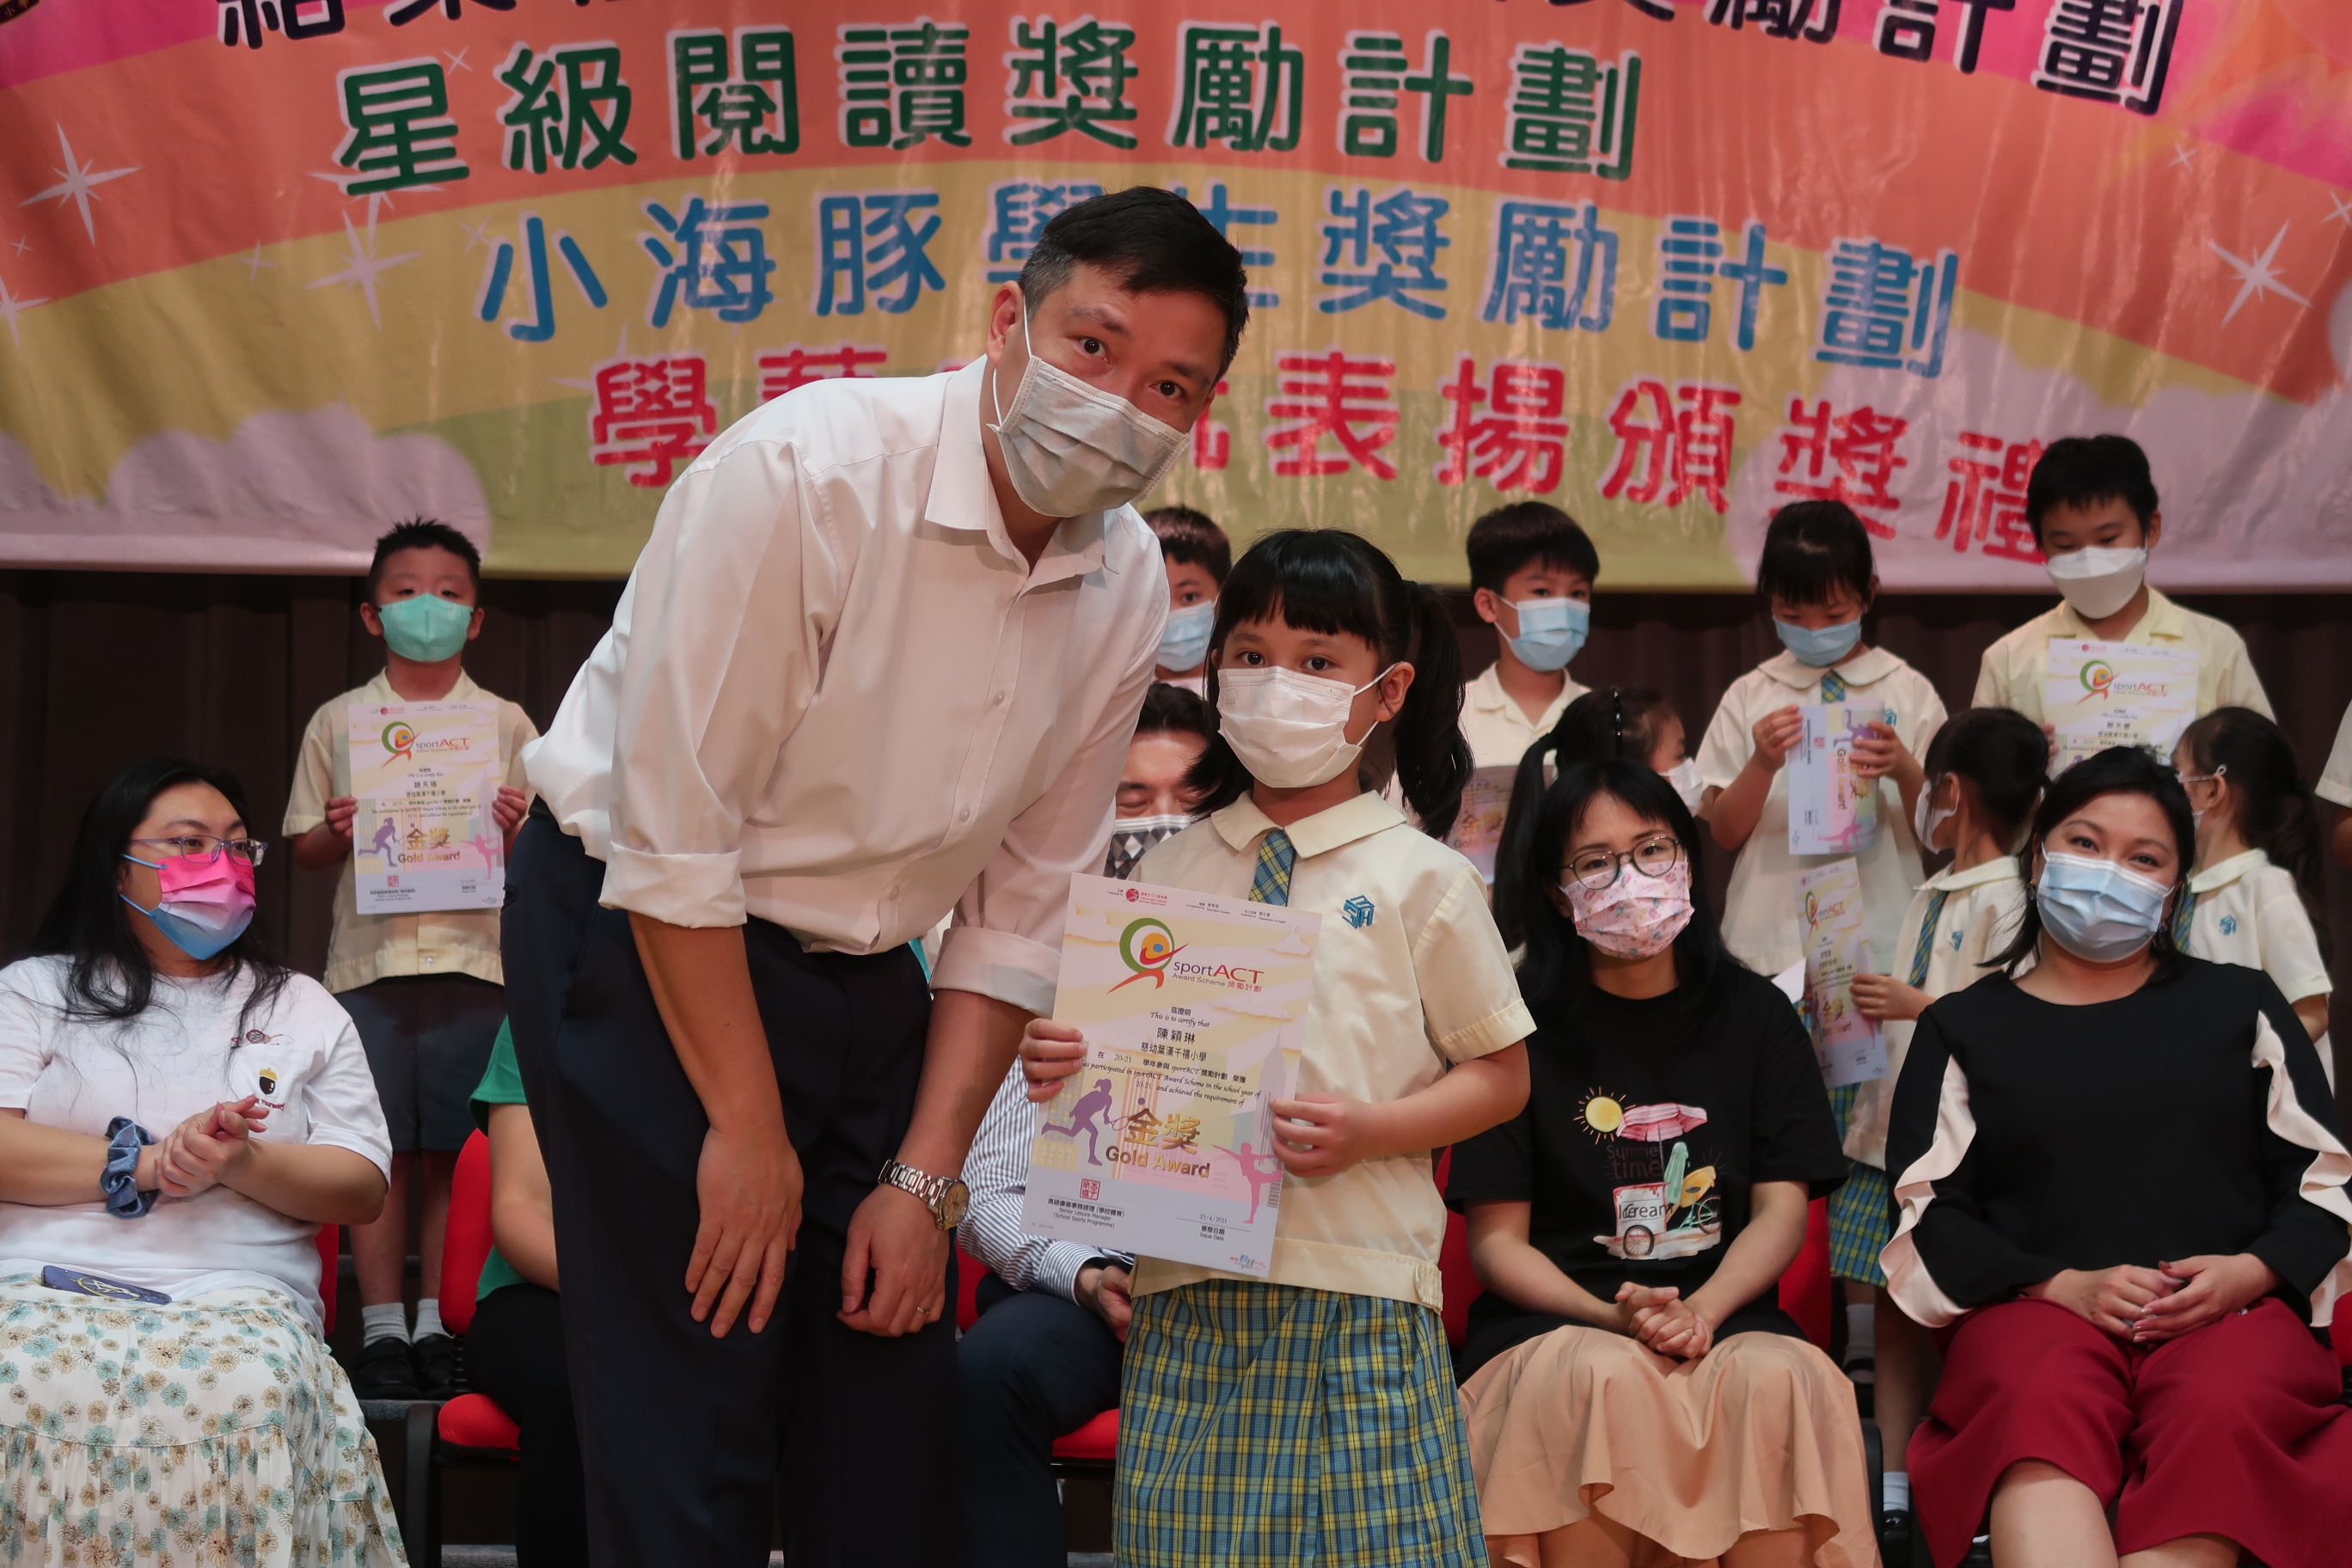 https://syh.edu.hk/sites/default/files/img_5910.jpg